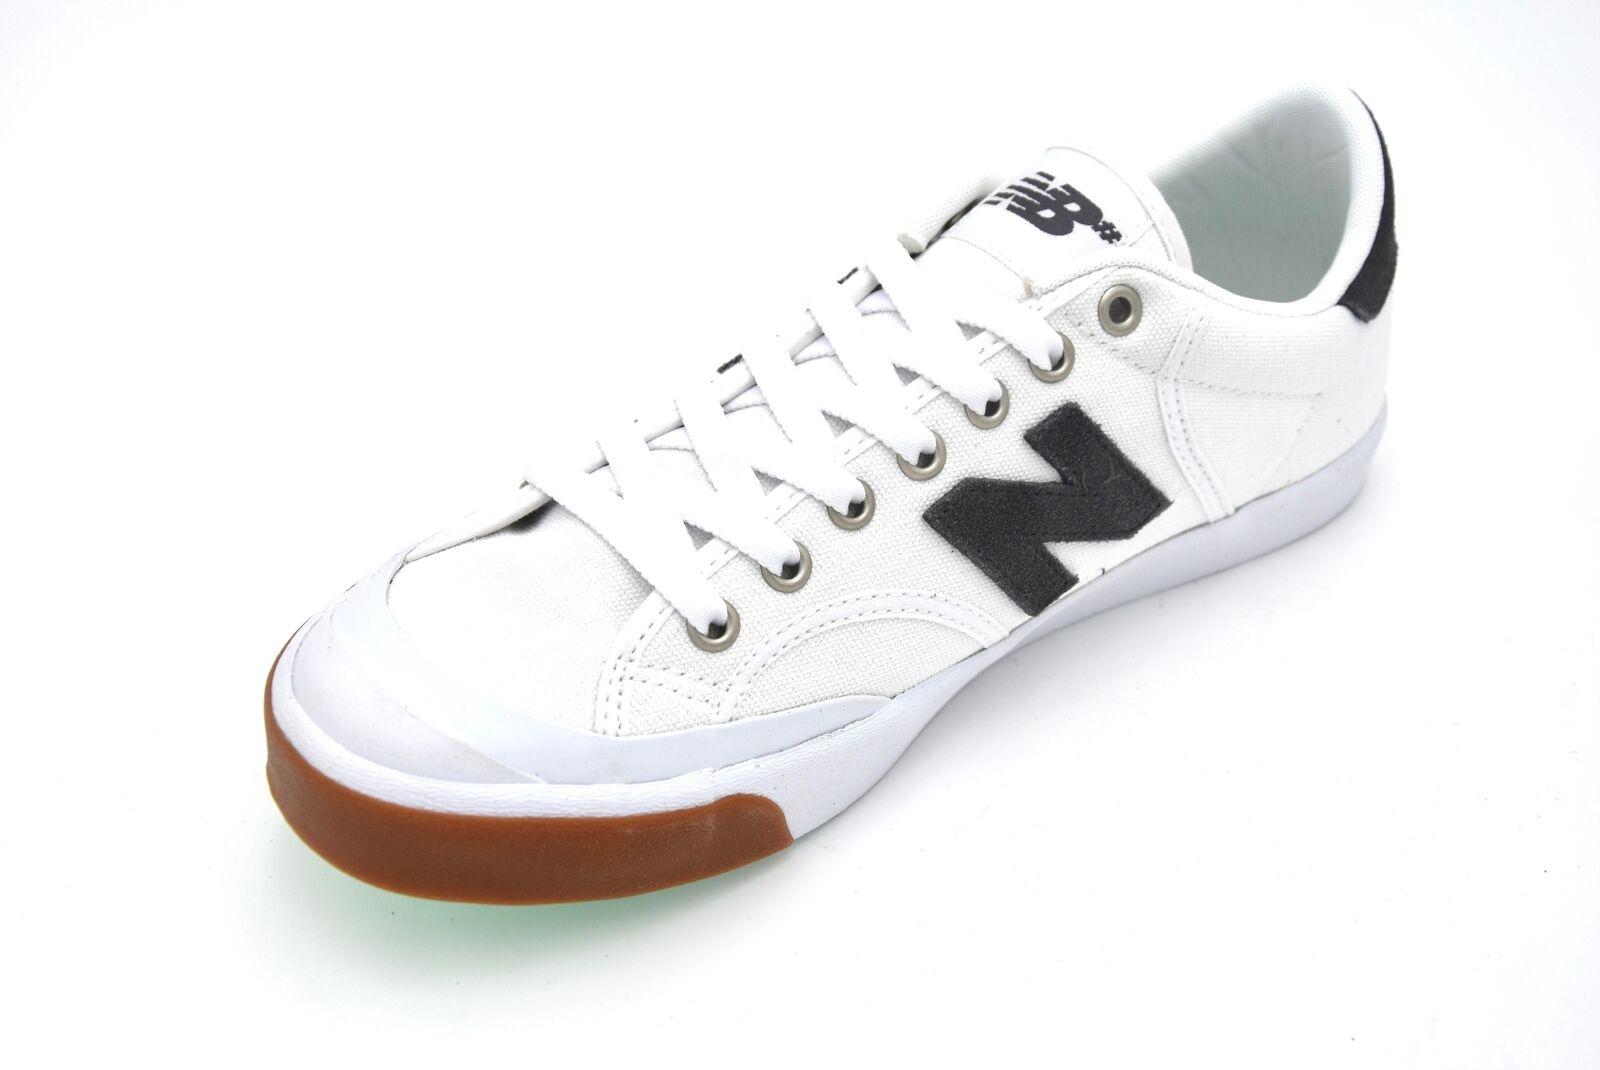 New balance mann zeit casual sneaker schuhe leinwand code code code nm212wgb 83400f